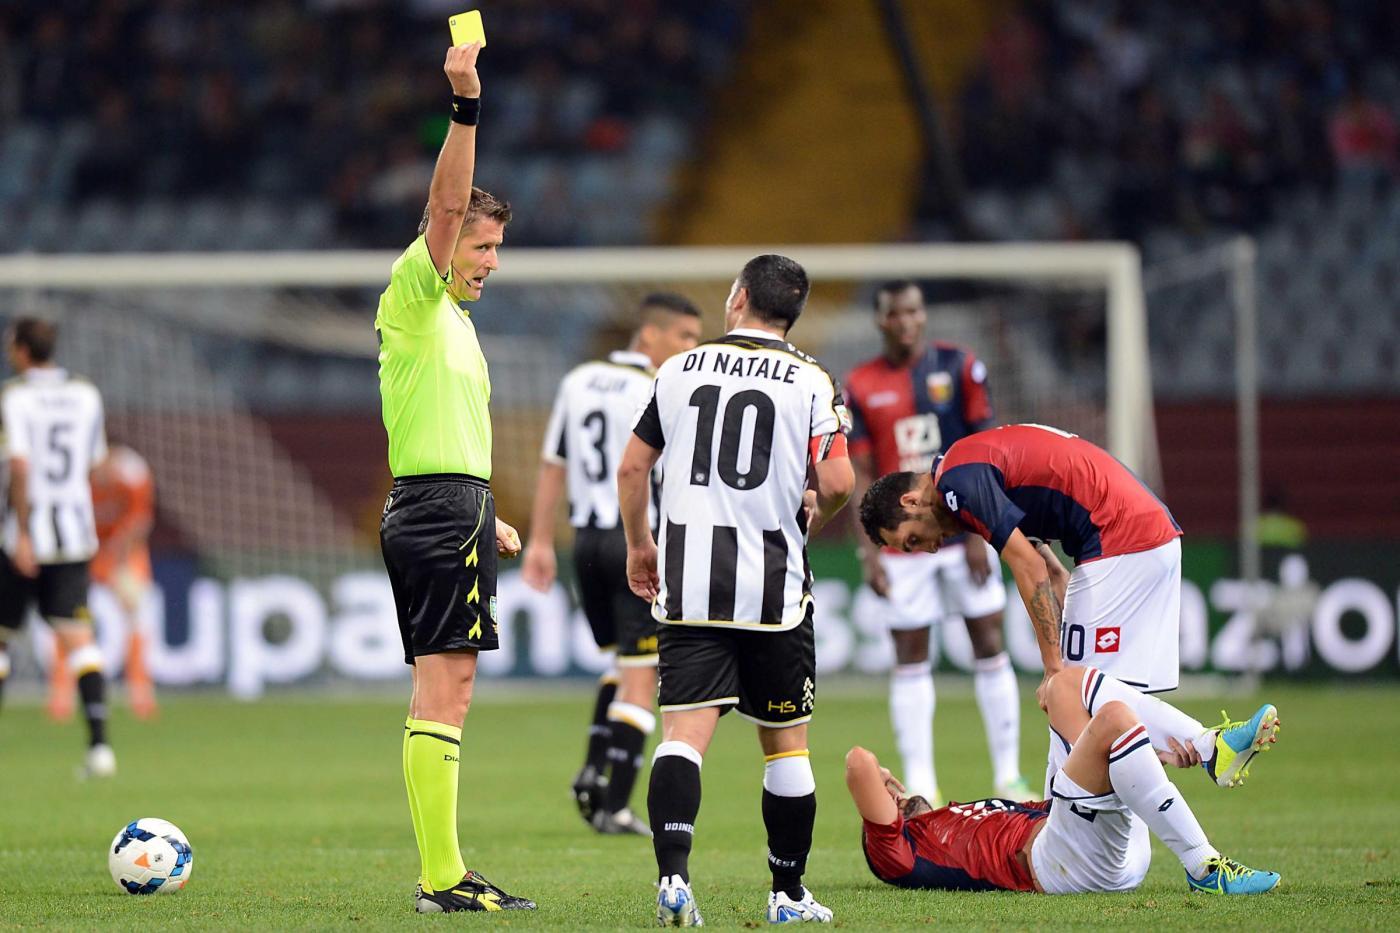 udinese genoa gol di natale death - photo#11